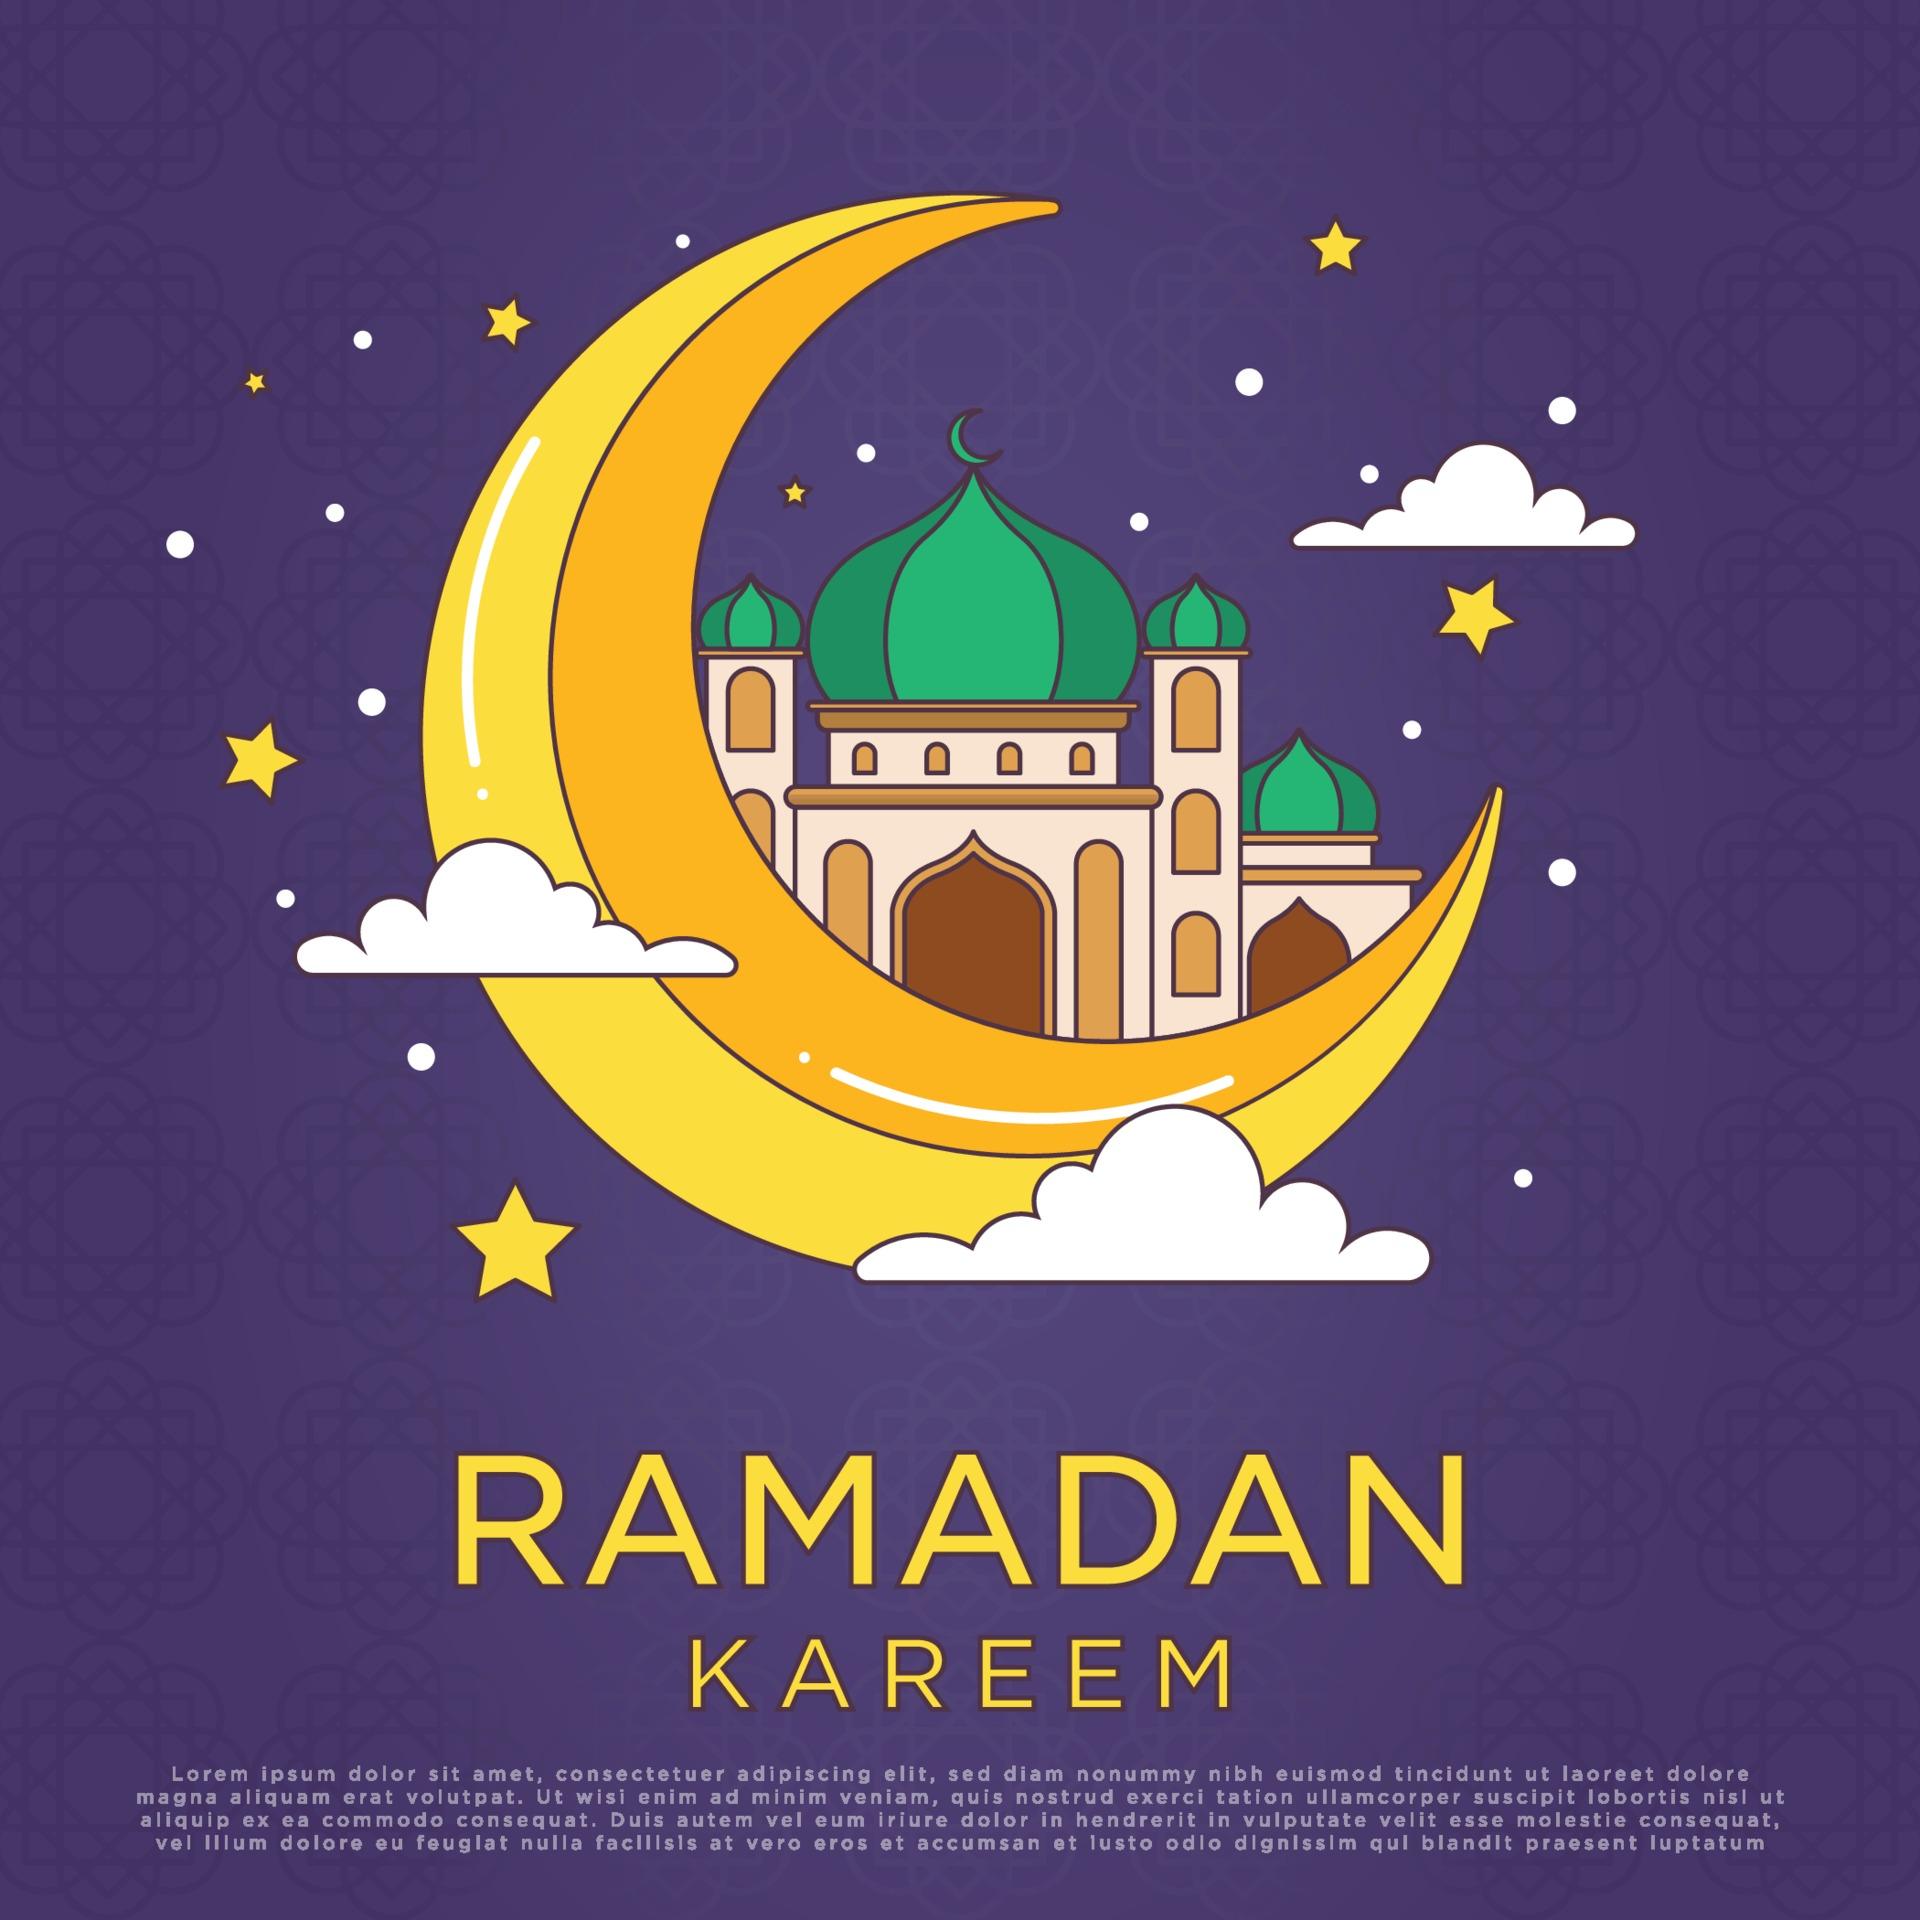 Simple Monoline Cartoon Ramadan Kareem Ornament With Bright Color Vector Illustration Mosque And Month Drawn Line Simple Background Eid Mubarak 2068007 Download Free Vectors Clipart Graphics Vector Art